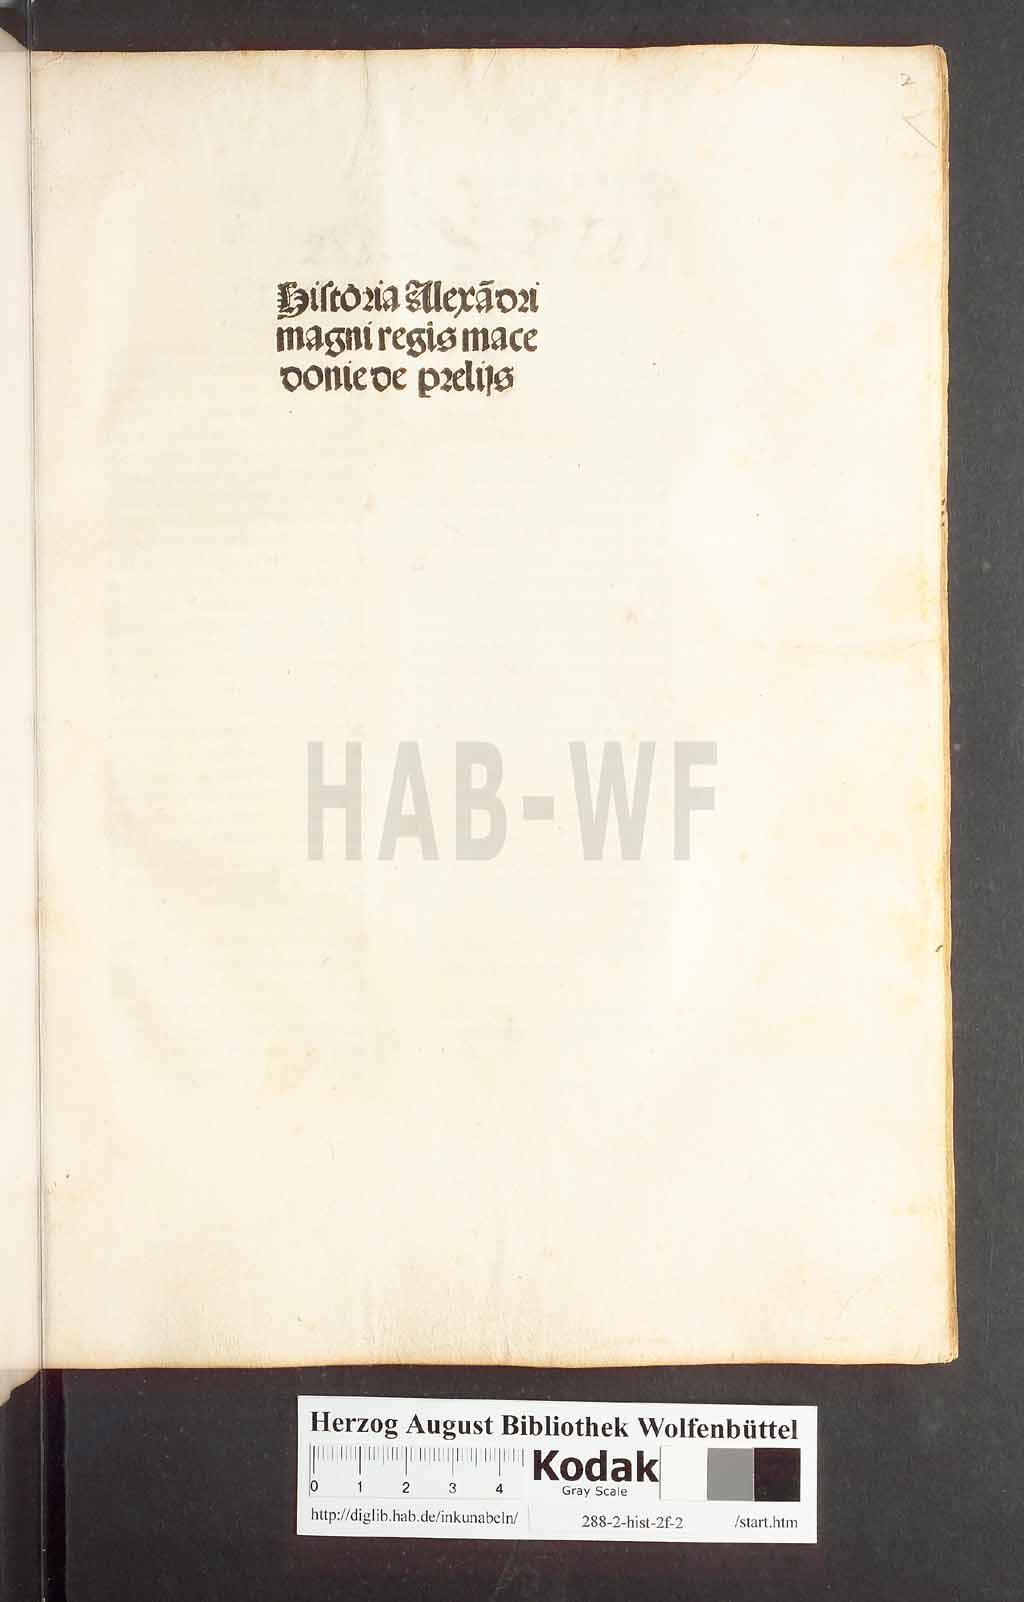 https://diglib.hab.de/inkunabeln/288-2-hist-2f-2/00001.jpg